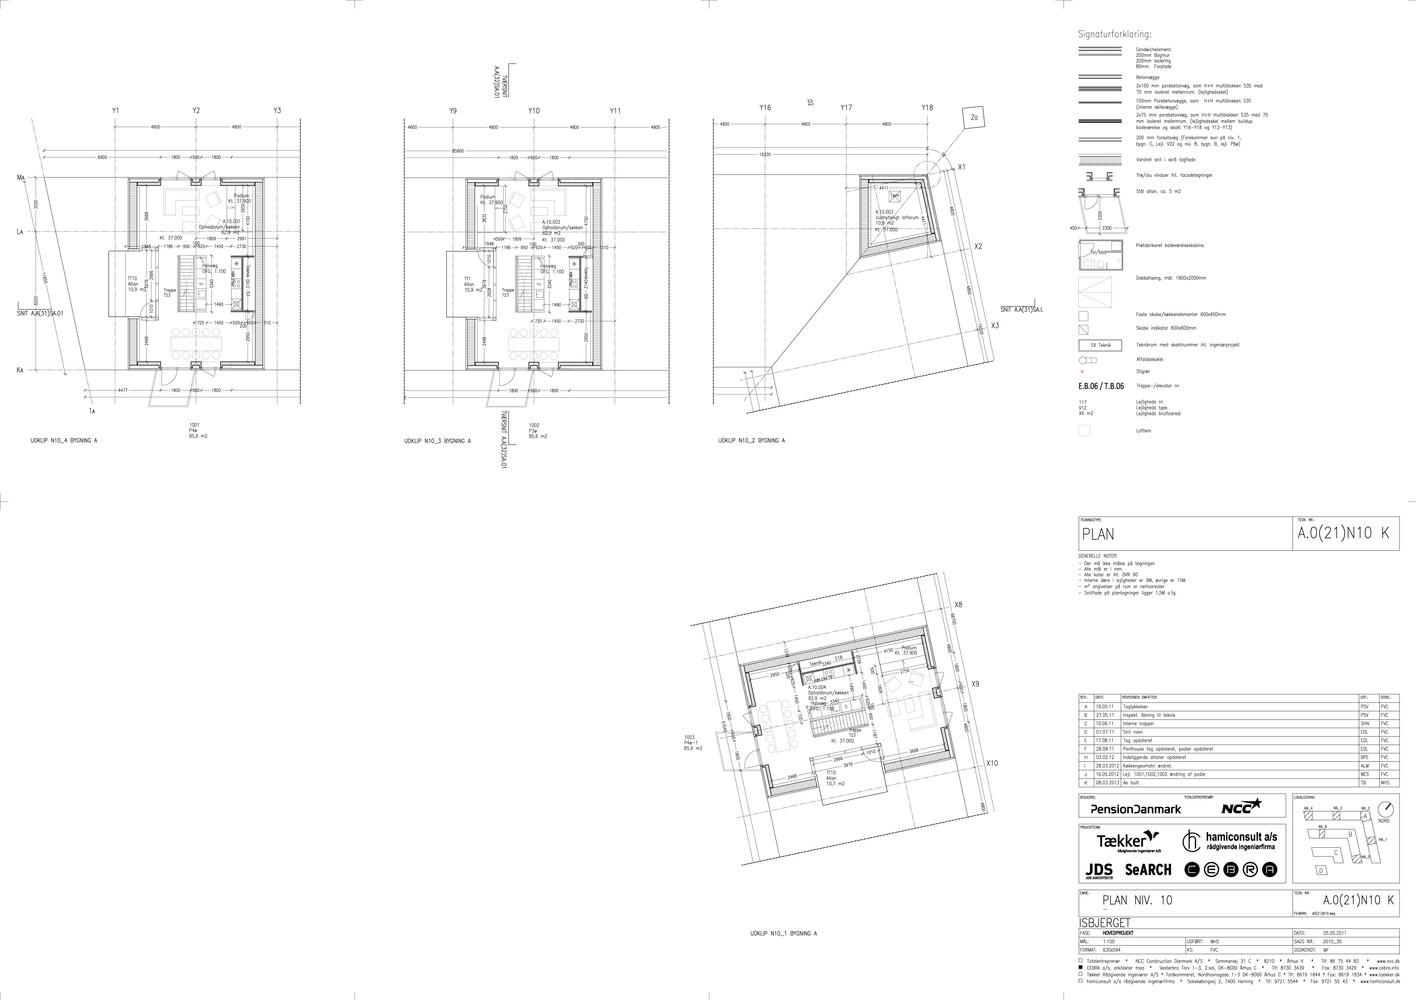 the iceberg search cebra jds louis paillard architects tenth floor plan [ 1416 x 1000 Pixel ]